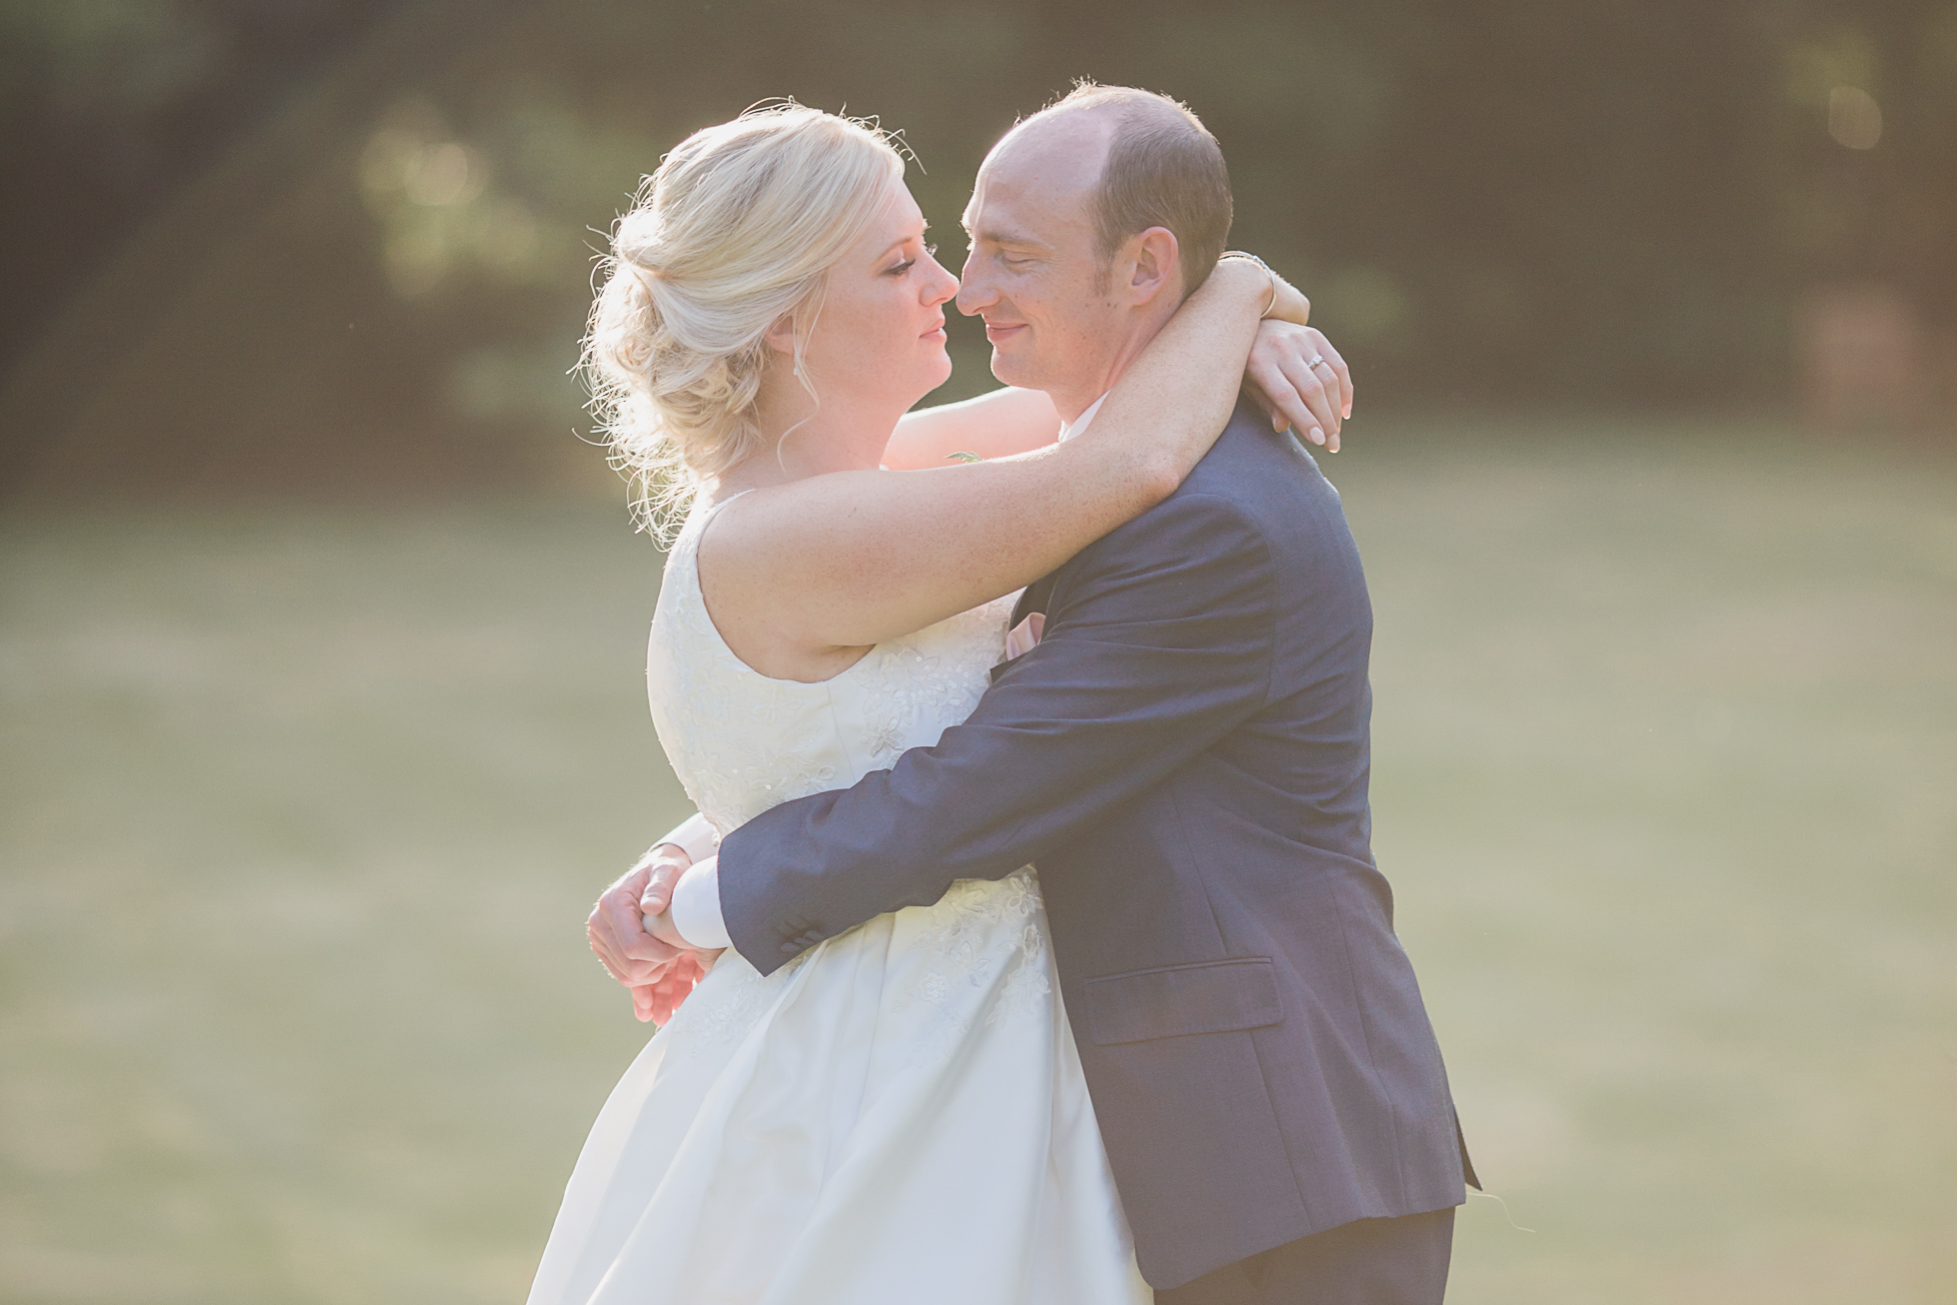 Wedding | Brandshatch Place Hotel – Fawkham | Lorna & Tim